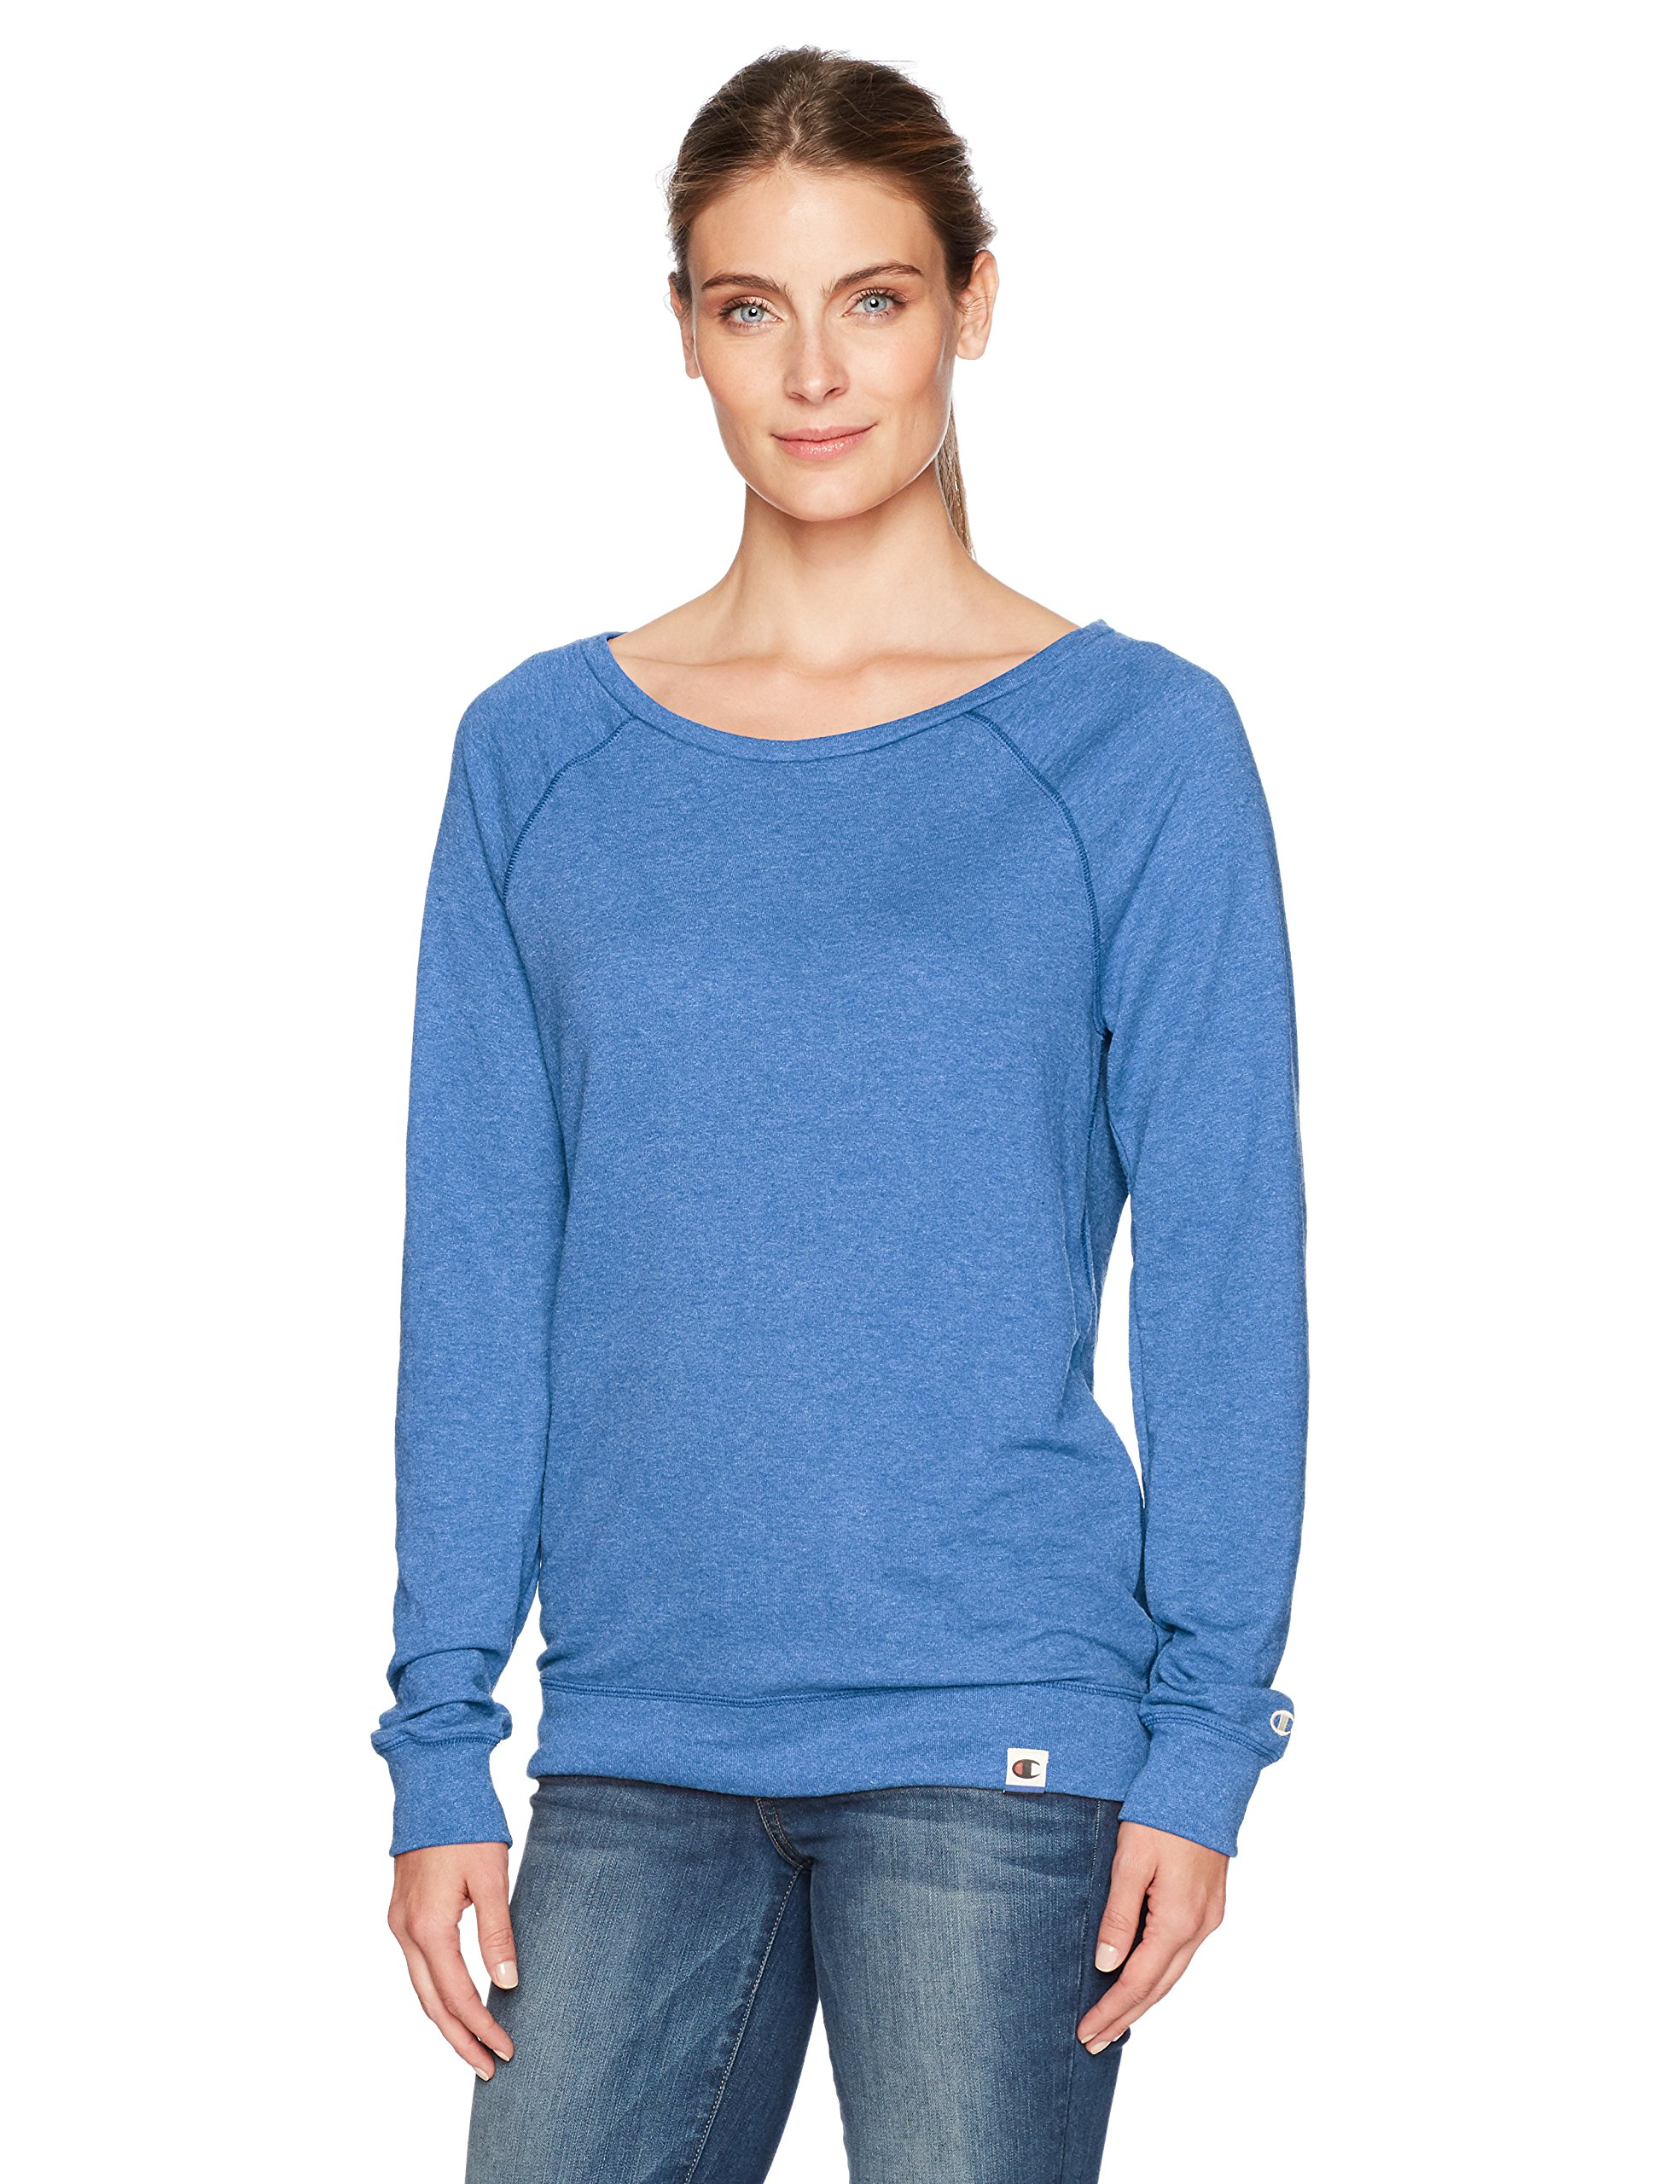 Champion Women's Authentic Originals French Terry Sweatshirt, Blue Jazz Heather, Medium